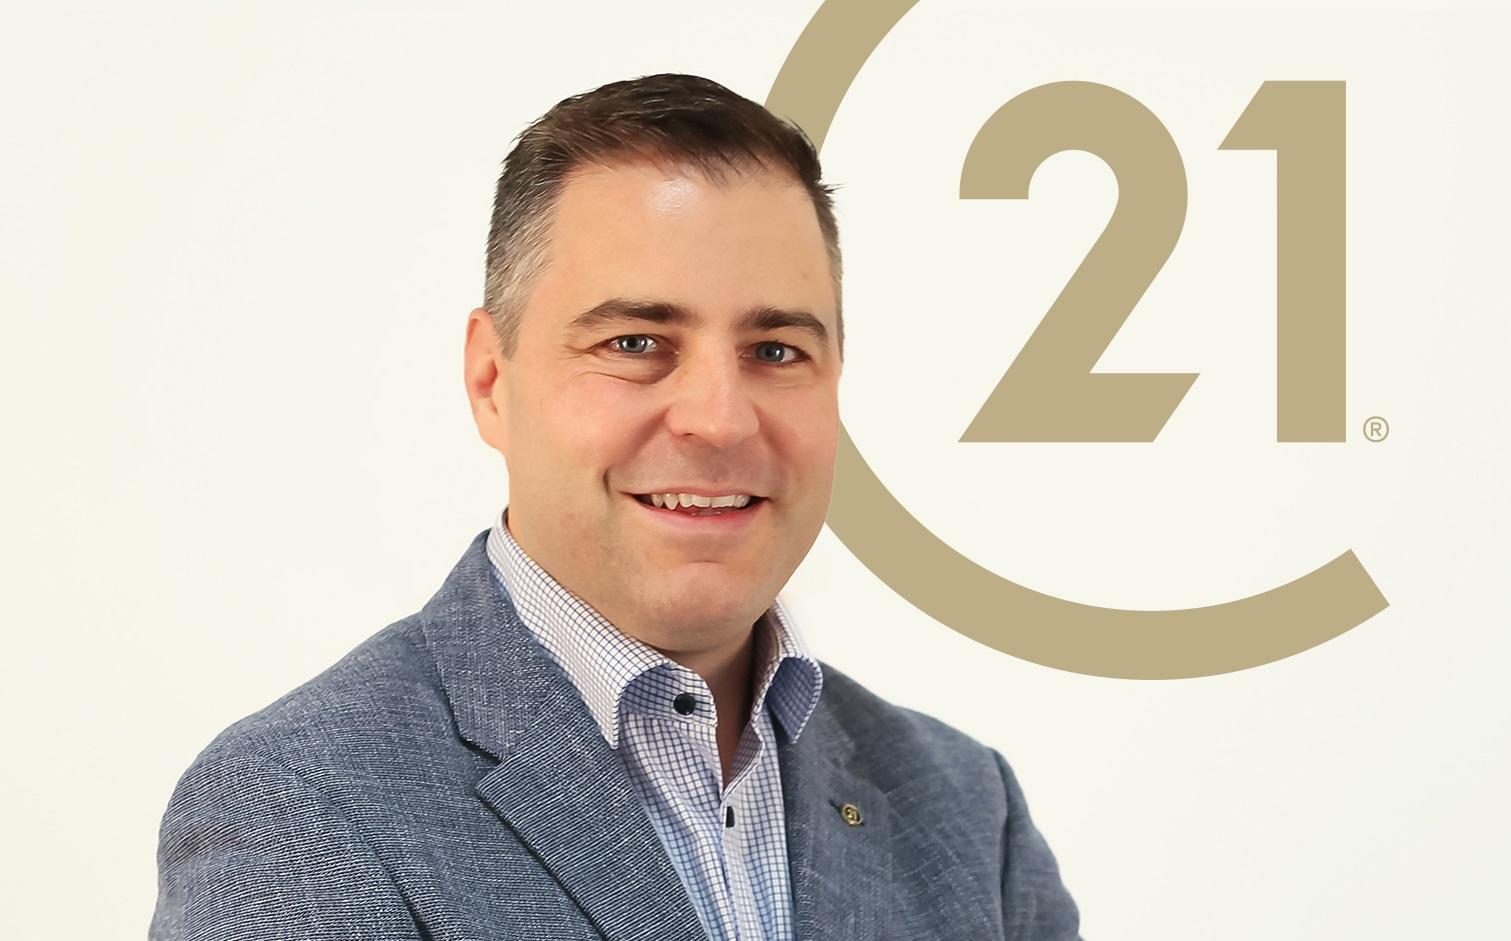 Christian Ammann, CEO da Century 21 Alemanha / Century 21